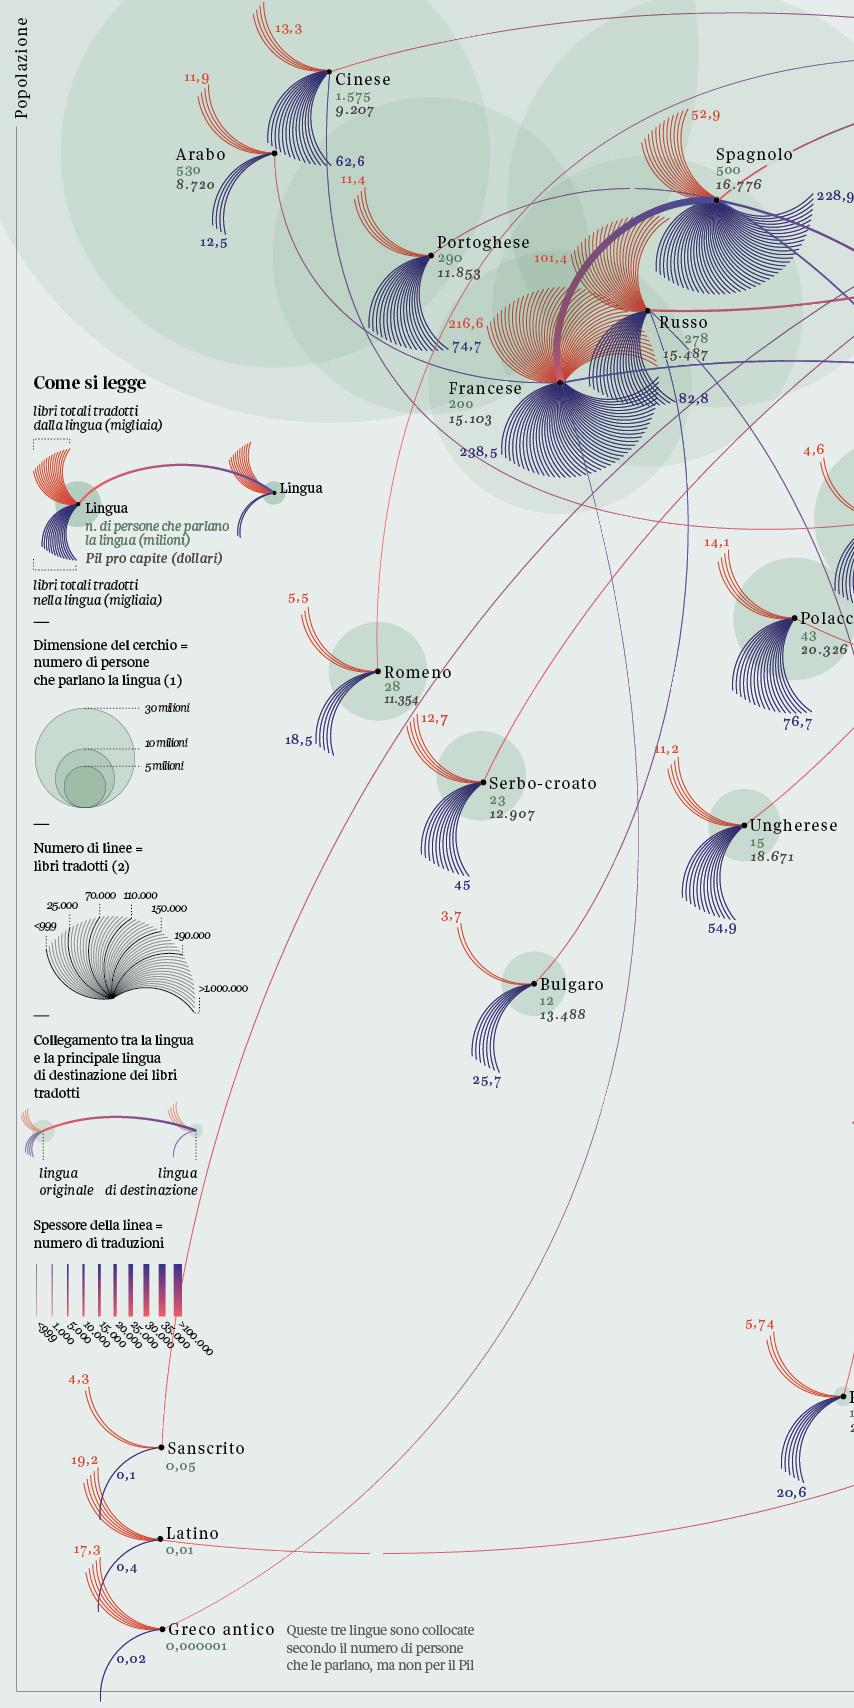 DATAVISUALIZATION Data visualization informationdesign information datajournalism InfoViz dataviz lines diagram network